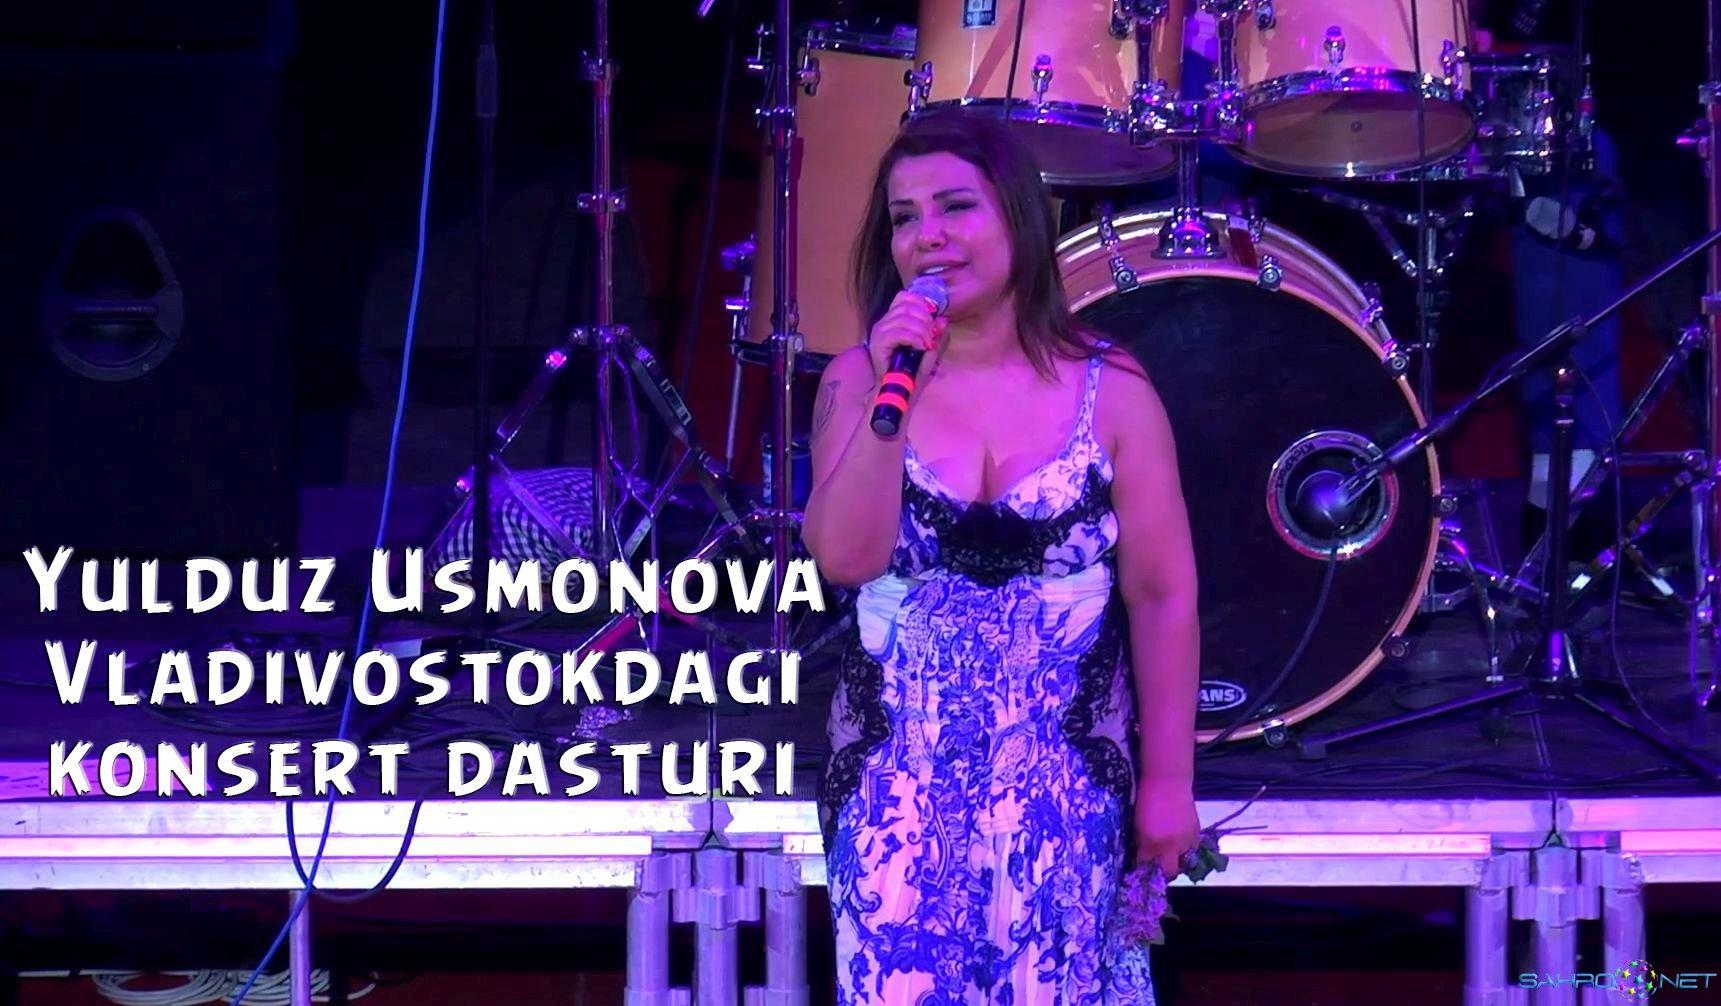 Yulduz Usmonova - Vladivostokdagi konsert dasturi 2014